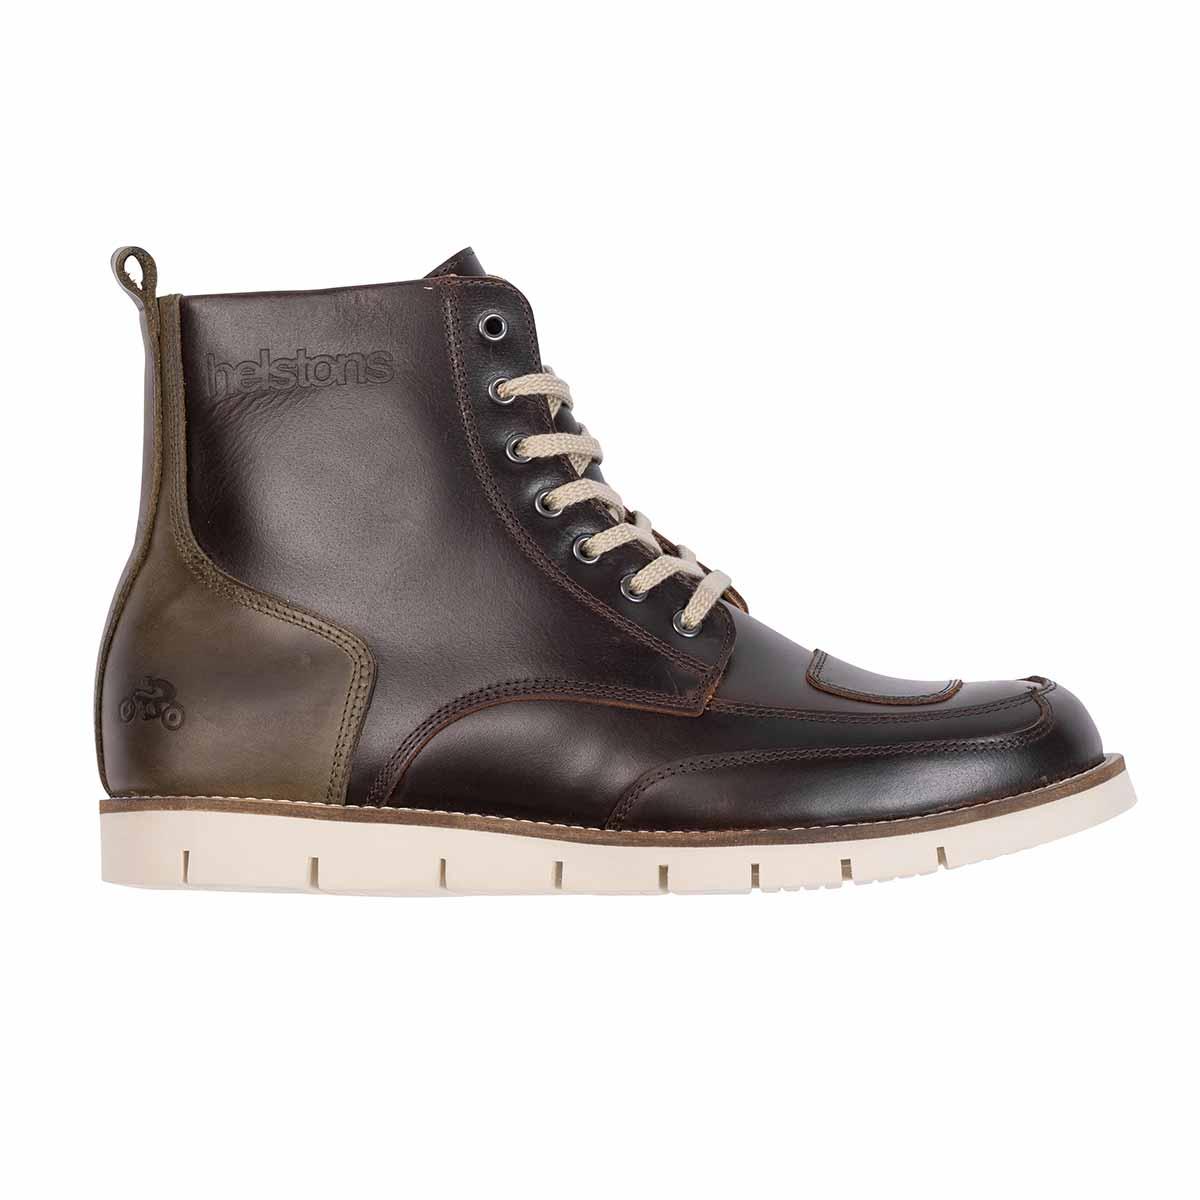 Helstons Liberty Brown/Khaki Boots